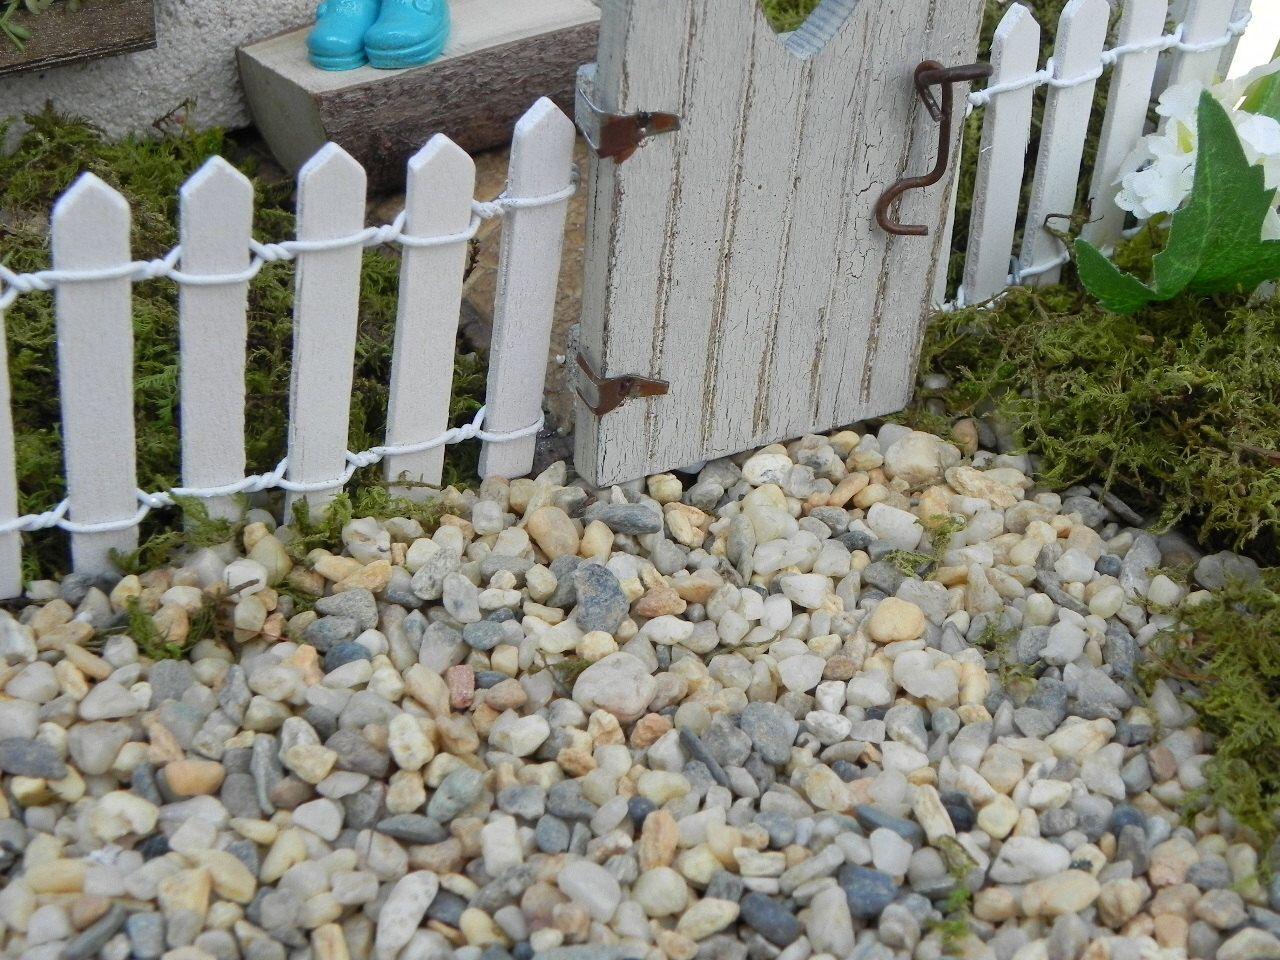 8 Ounces White Pebbles Miniature Dollhouse FAIRY GARDEN Accessories